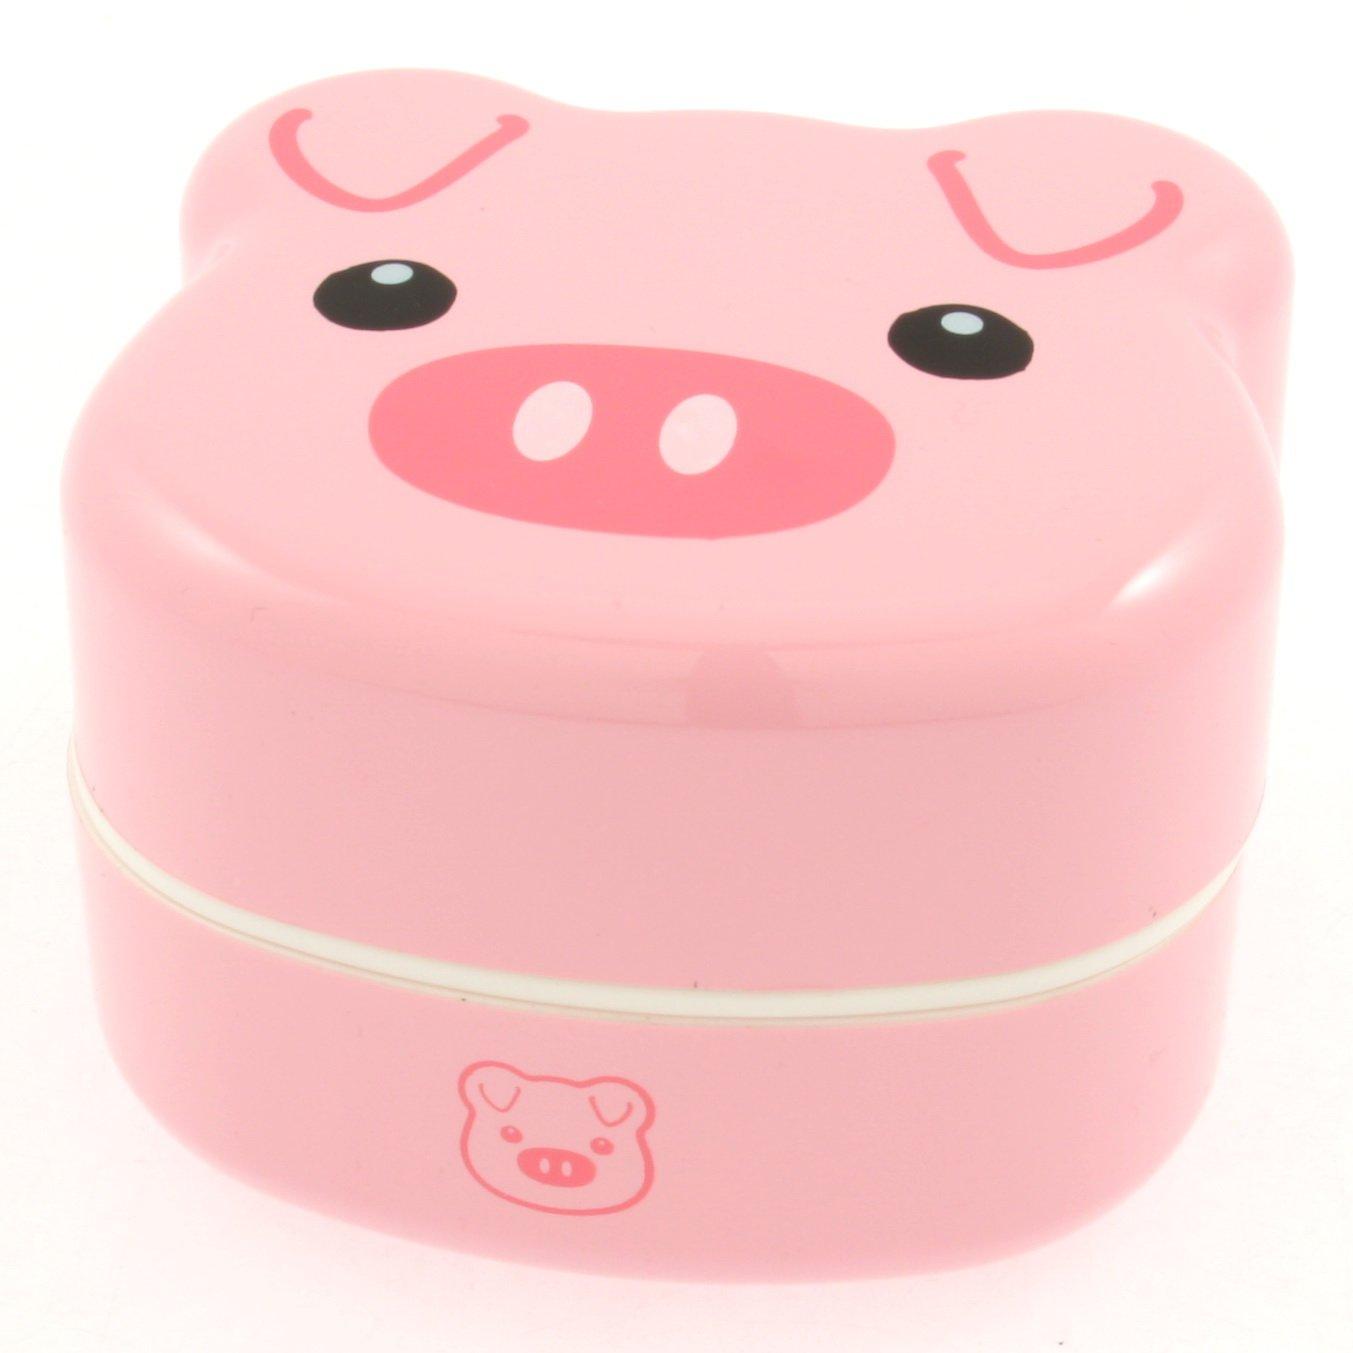 Kotobuki 2-Tiered Bento Box, Piggy by Kotobuki